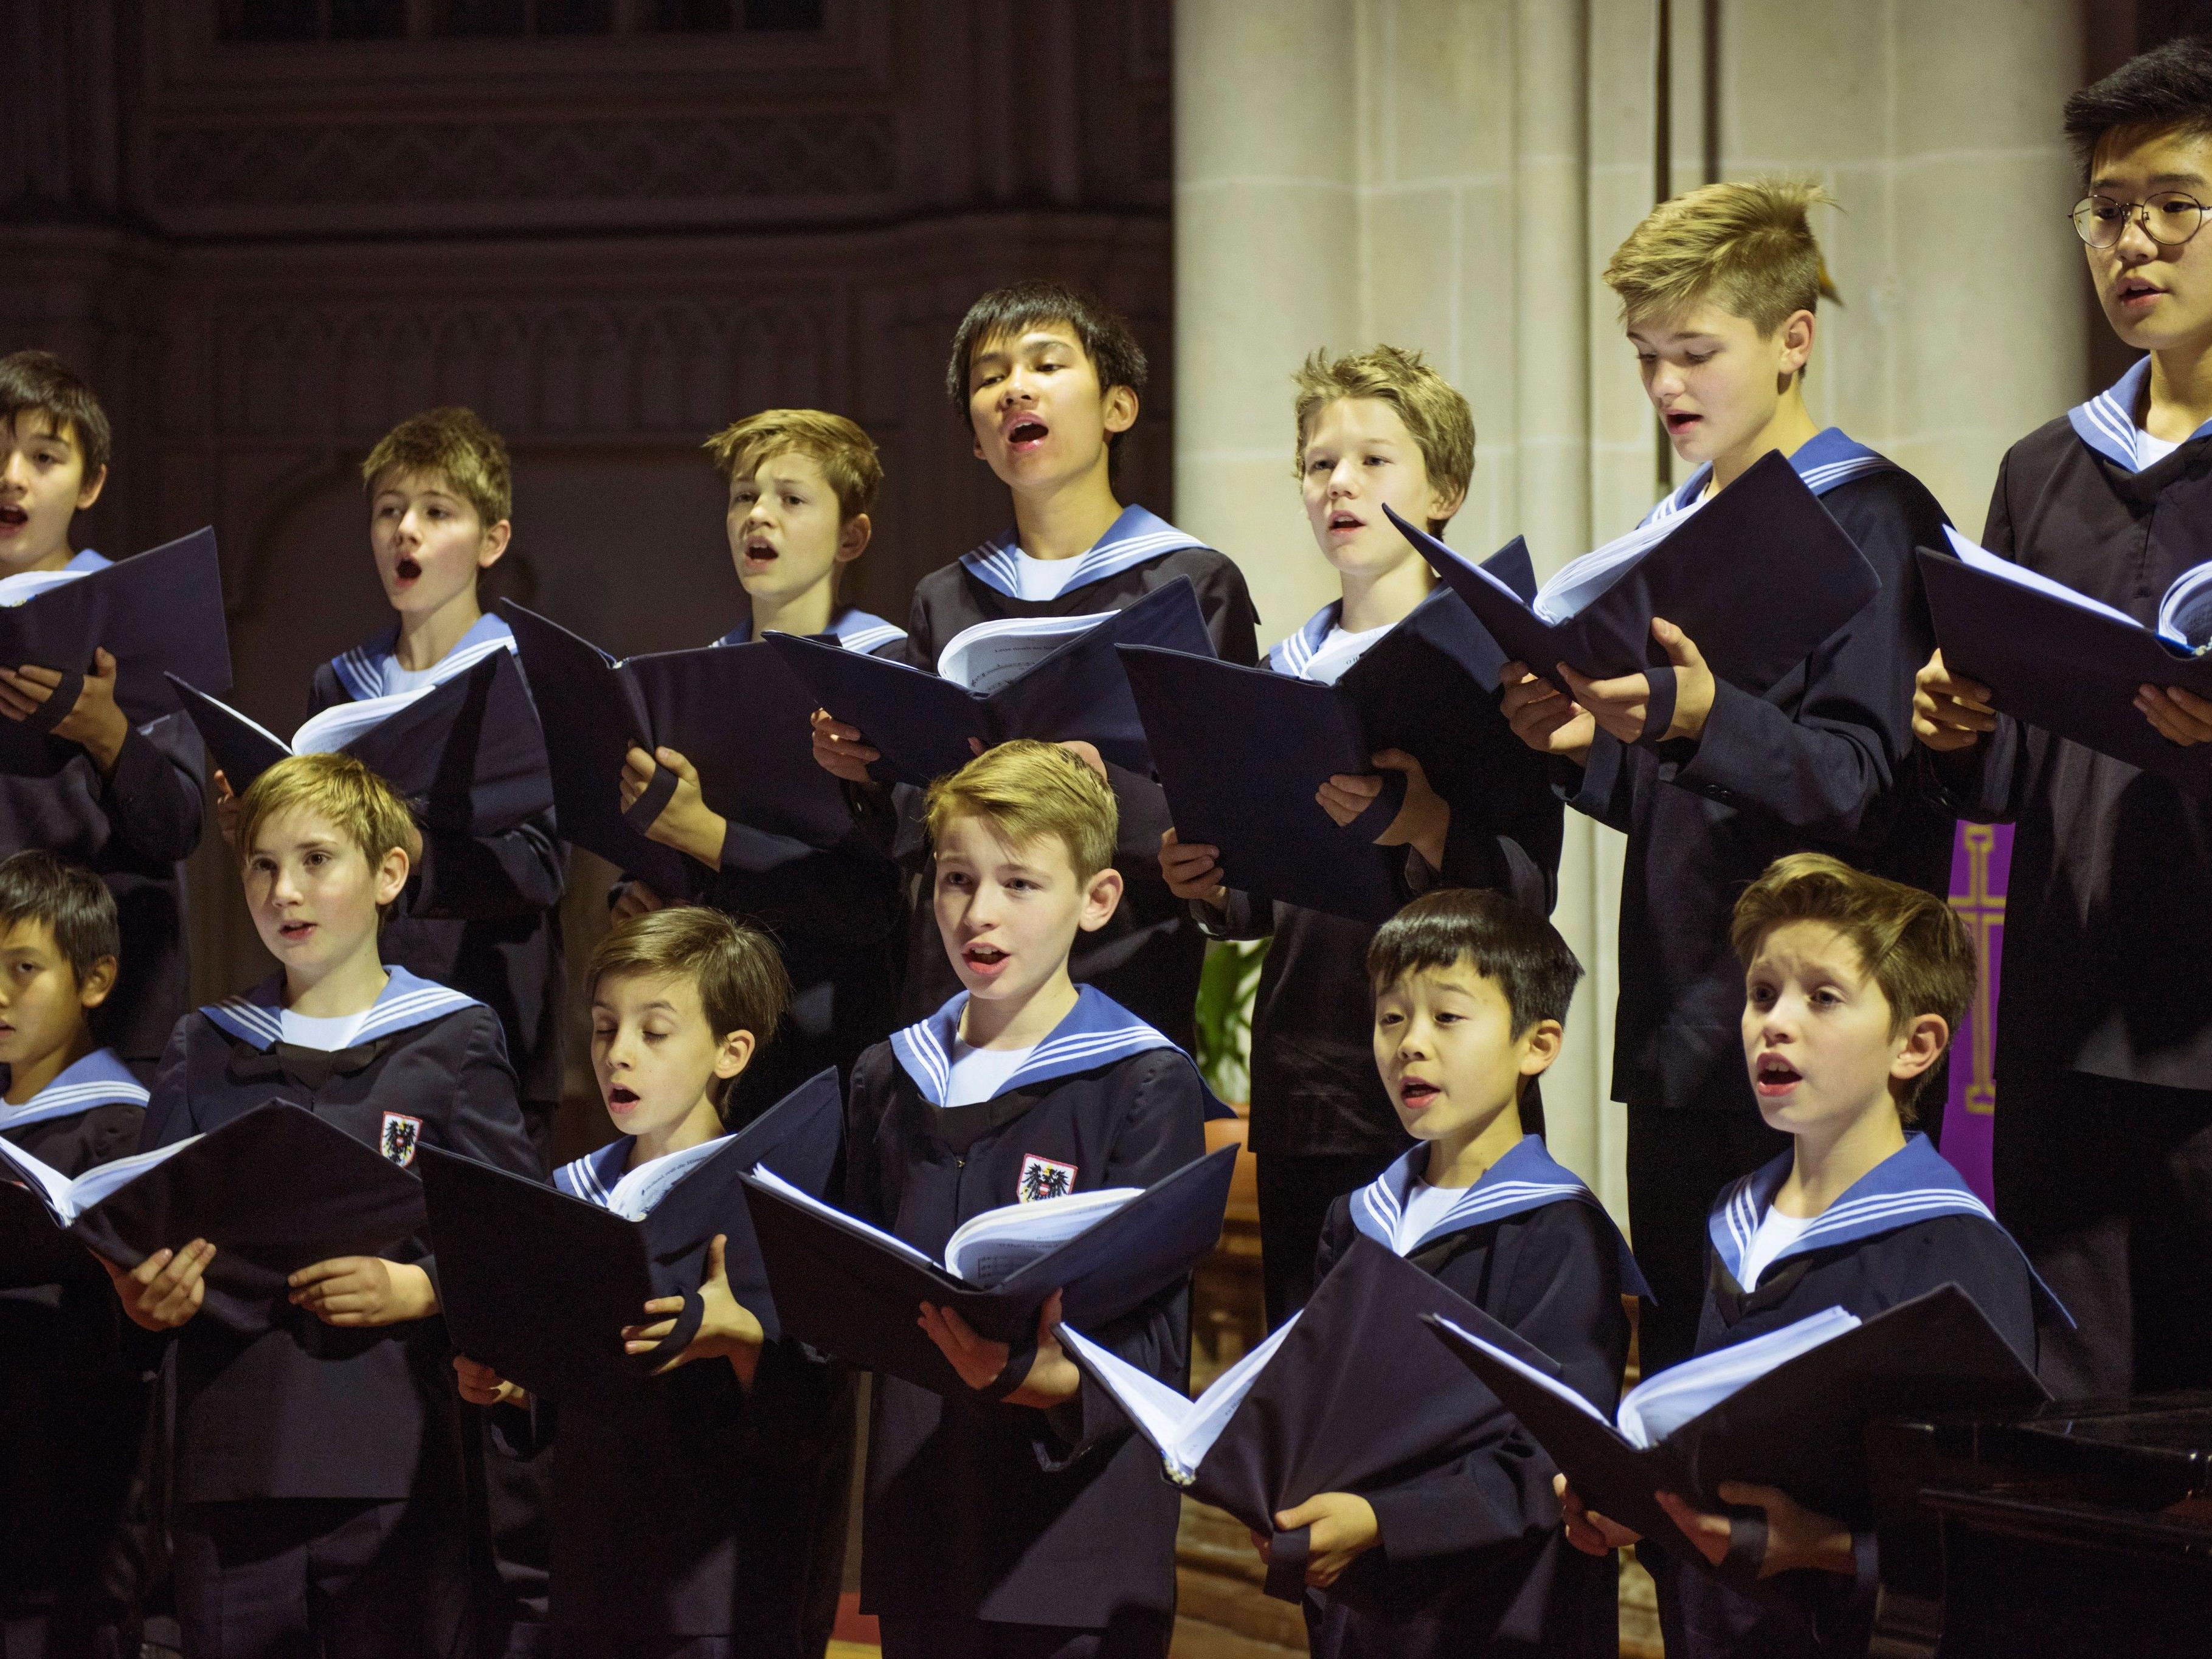 Wiener Sängerknaben: Ausbildung und Chorgesang sind Immaterielles Kulturerbe